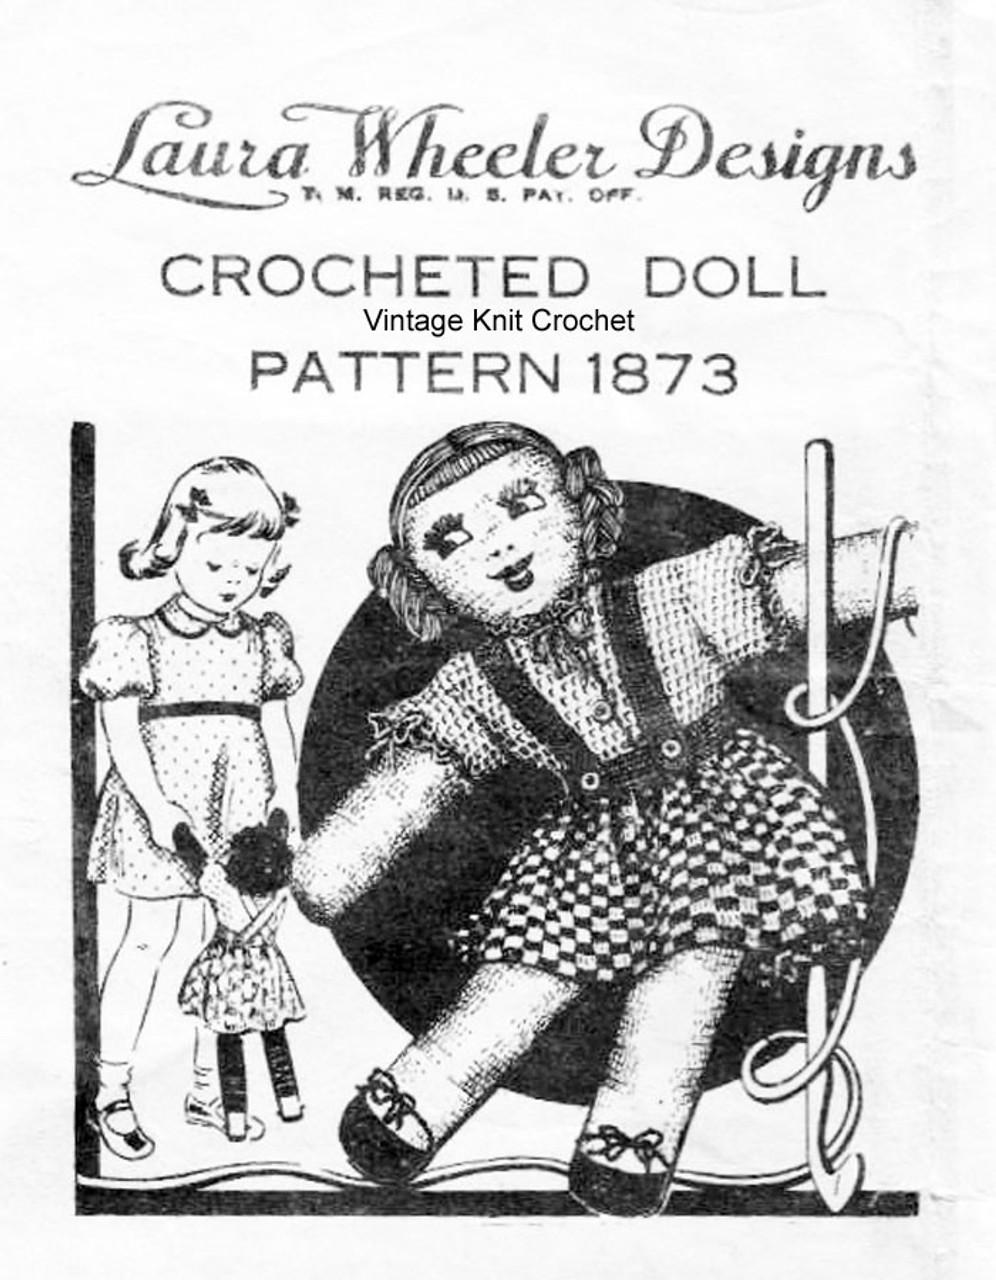 Vintage Crocheted Doll Pattern Design 1873